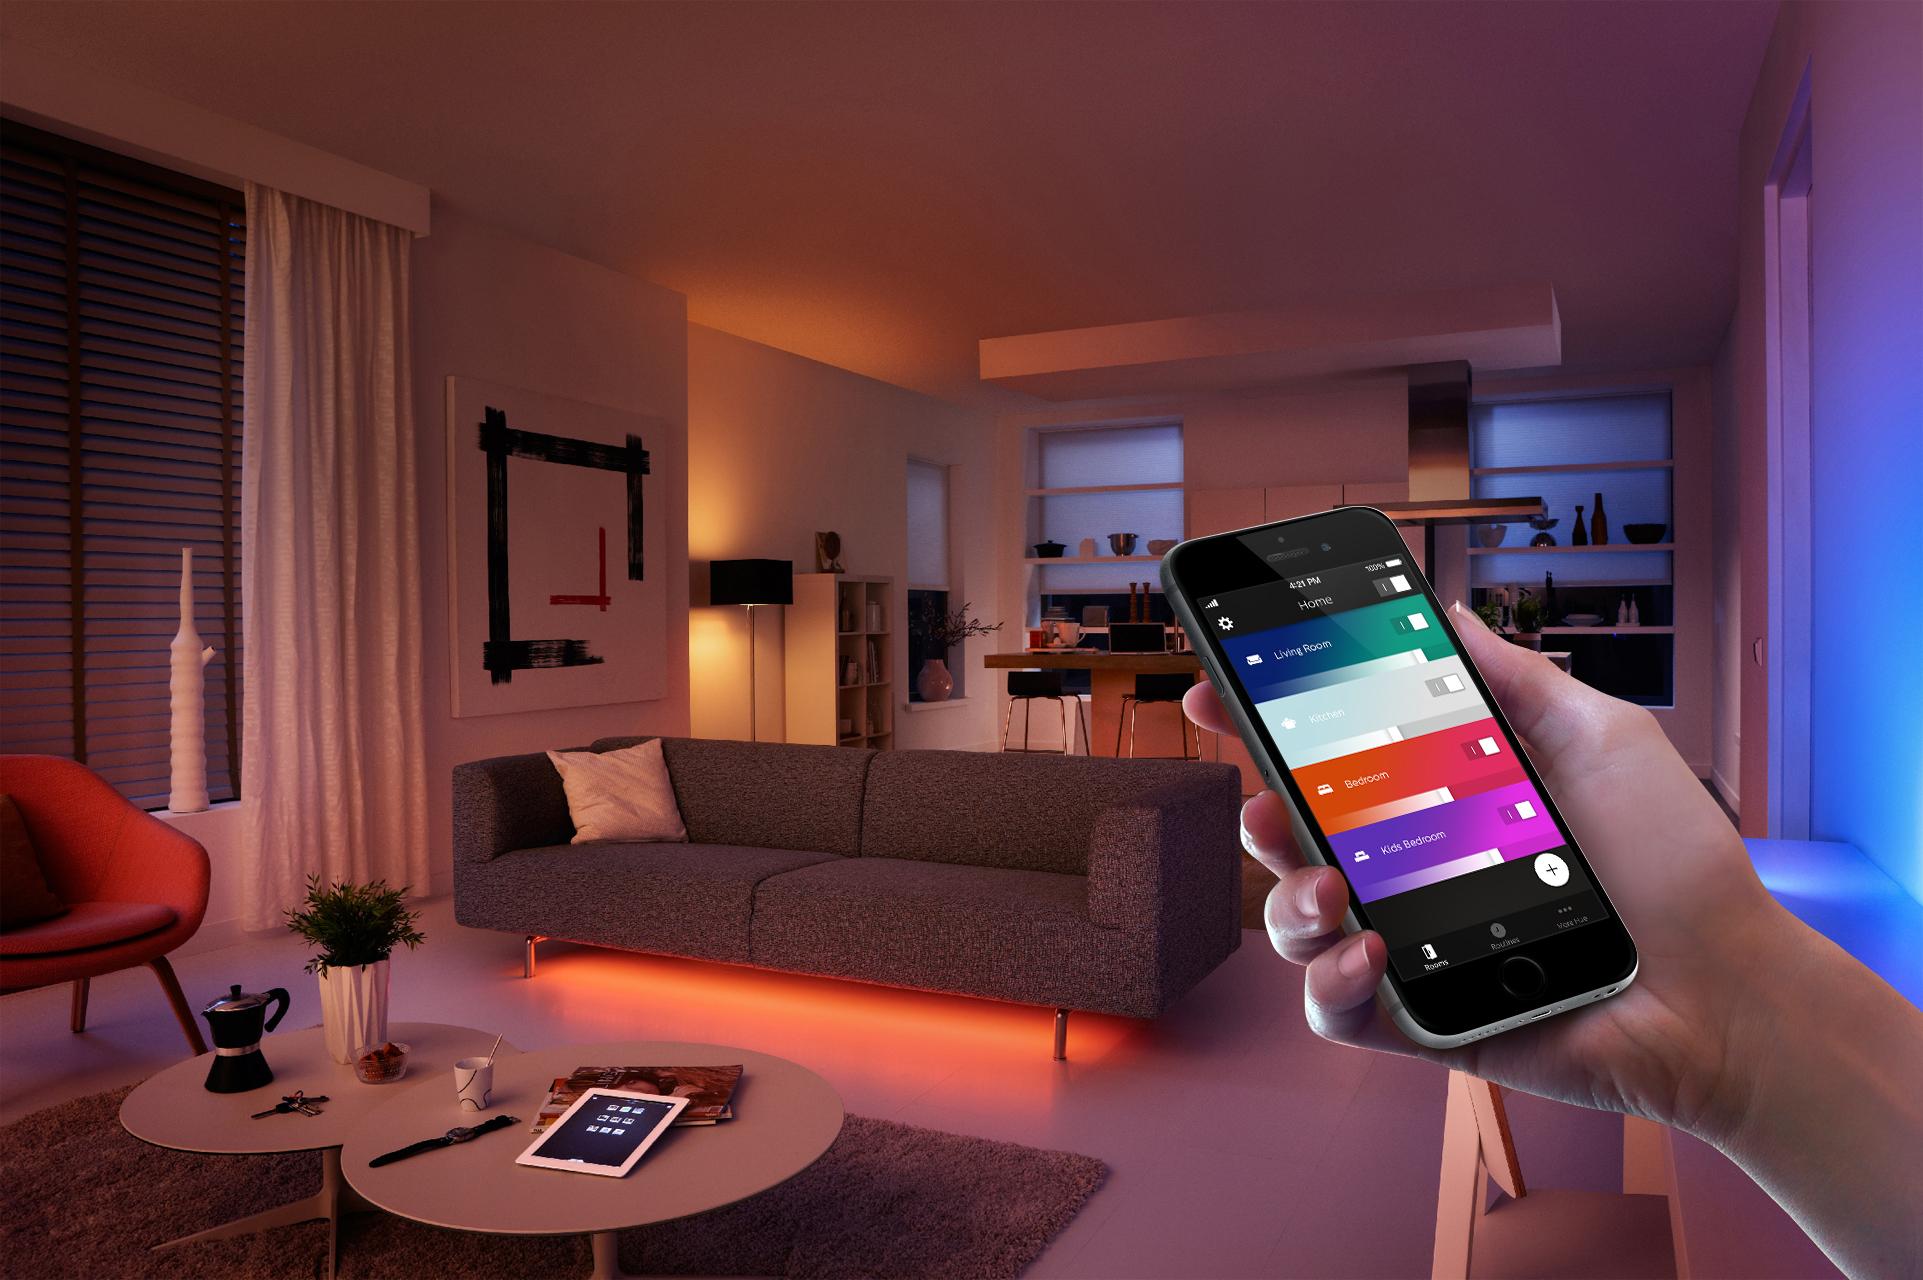 Neue Philips Hue App Macht Beleuchtung Intelligenter News